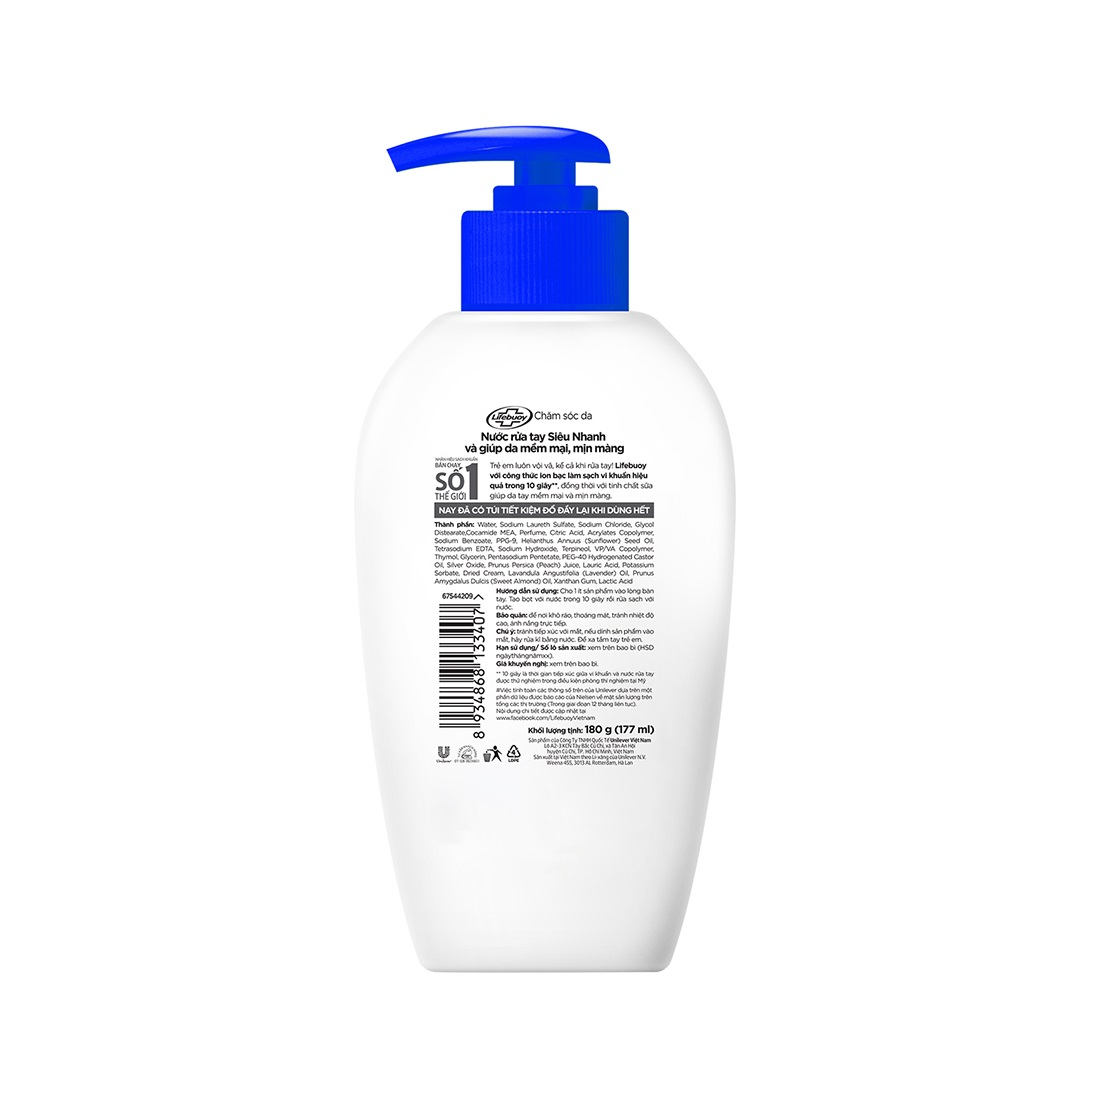 Nước rửa tay lifebuoy chăm sóc da 500g (Chai)